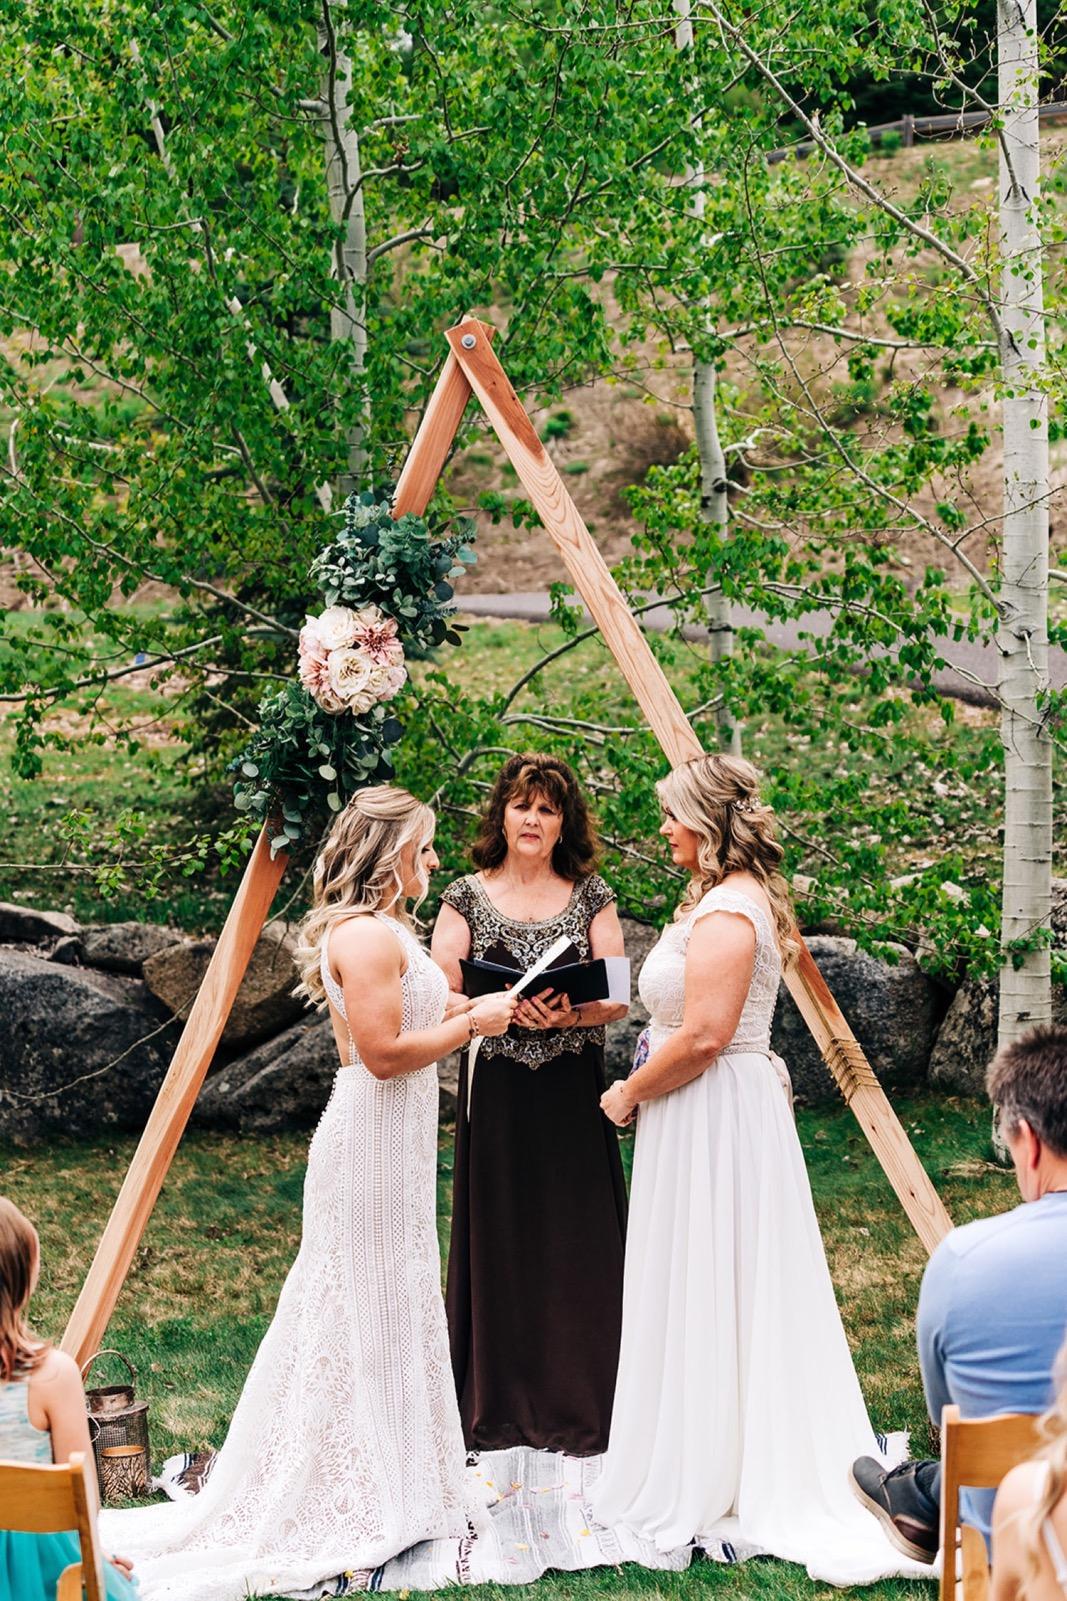 071_falissa_heather_wedding-178.jpg